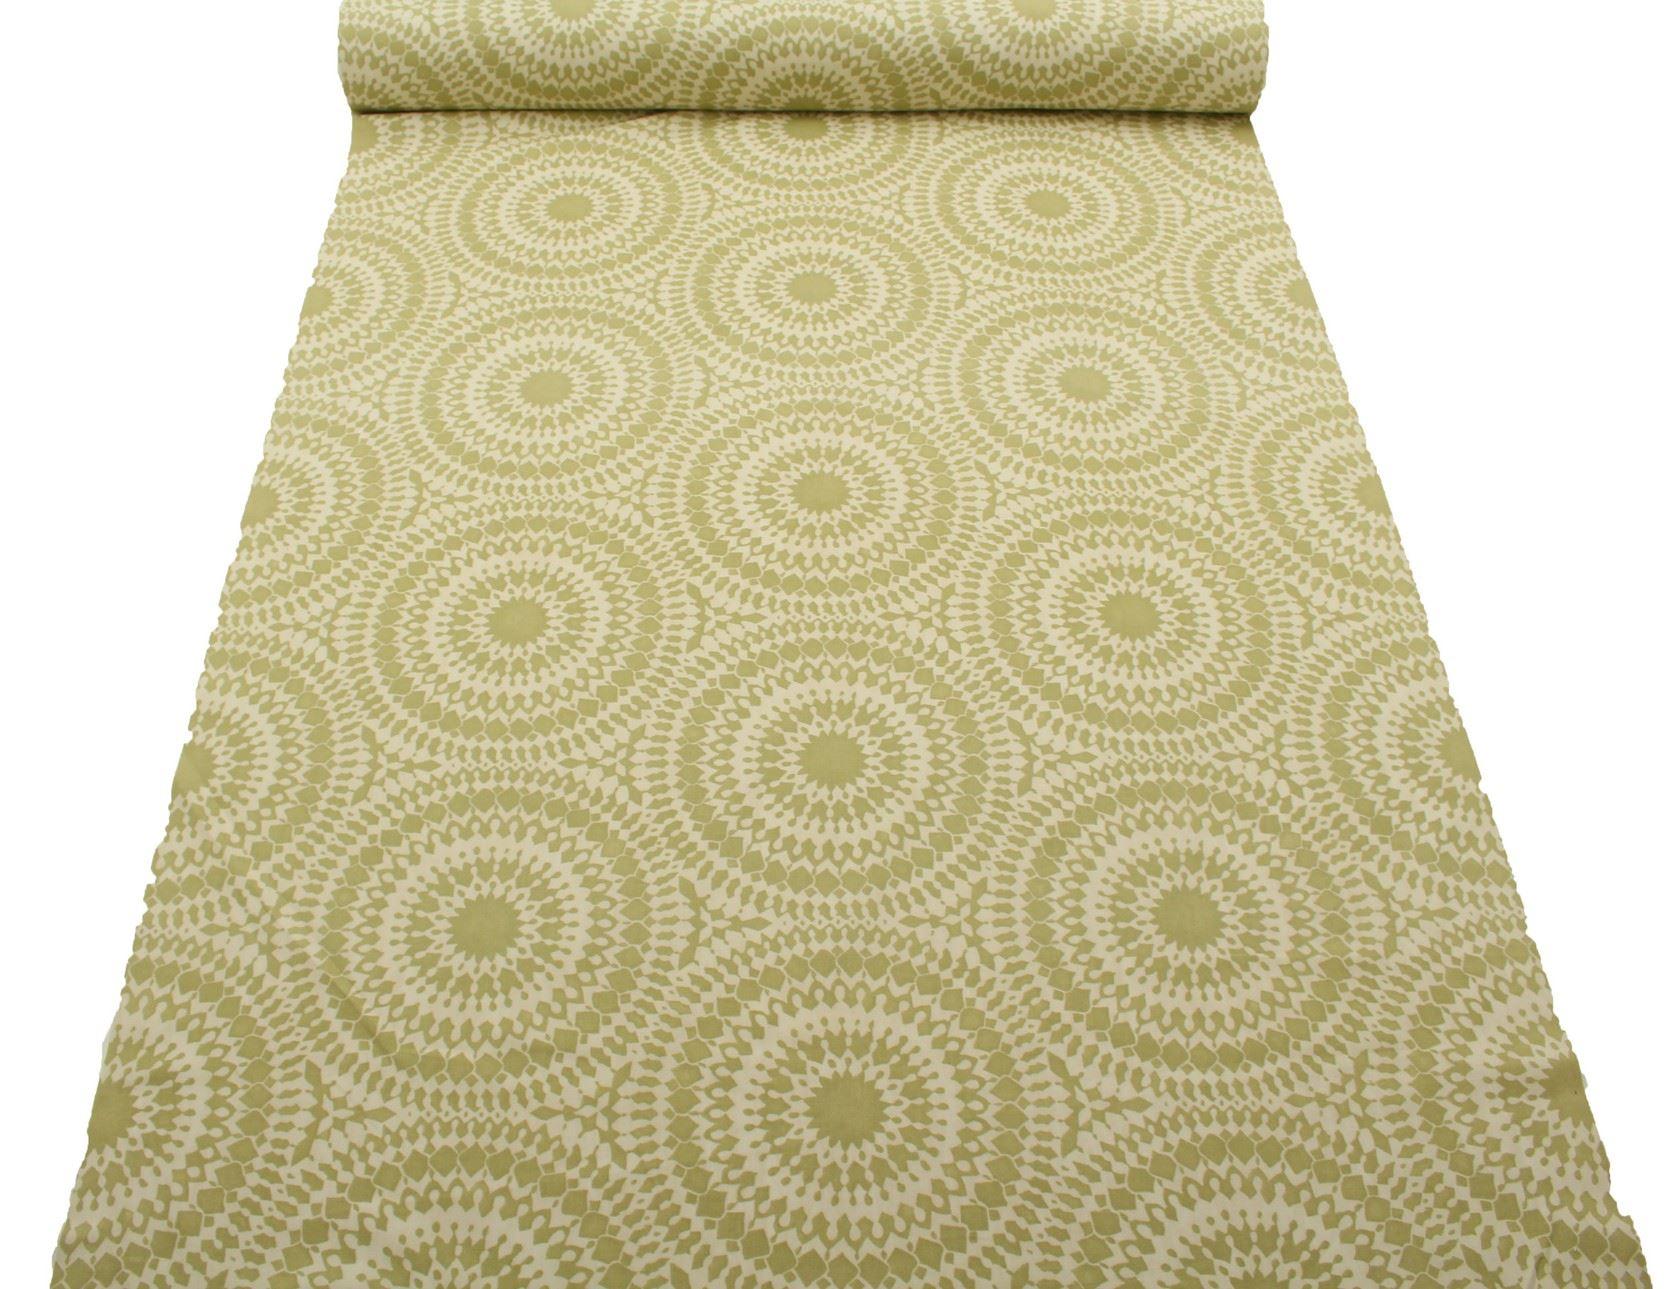 printed fabric sofa designs thomasville leather reclining harlequin designer cotton jute floral heavy prints curtain